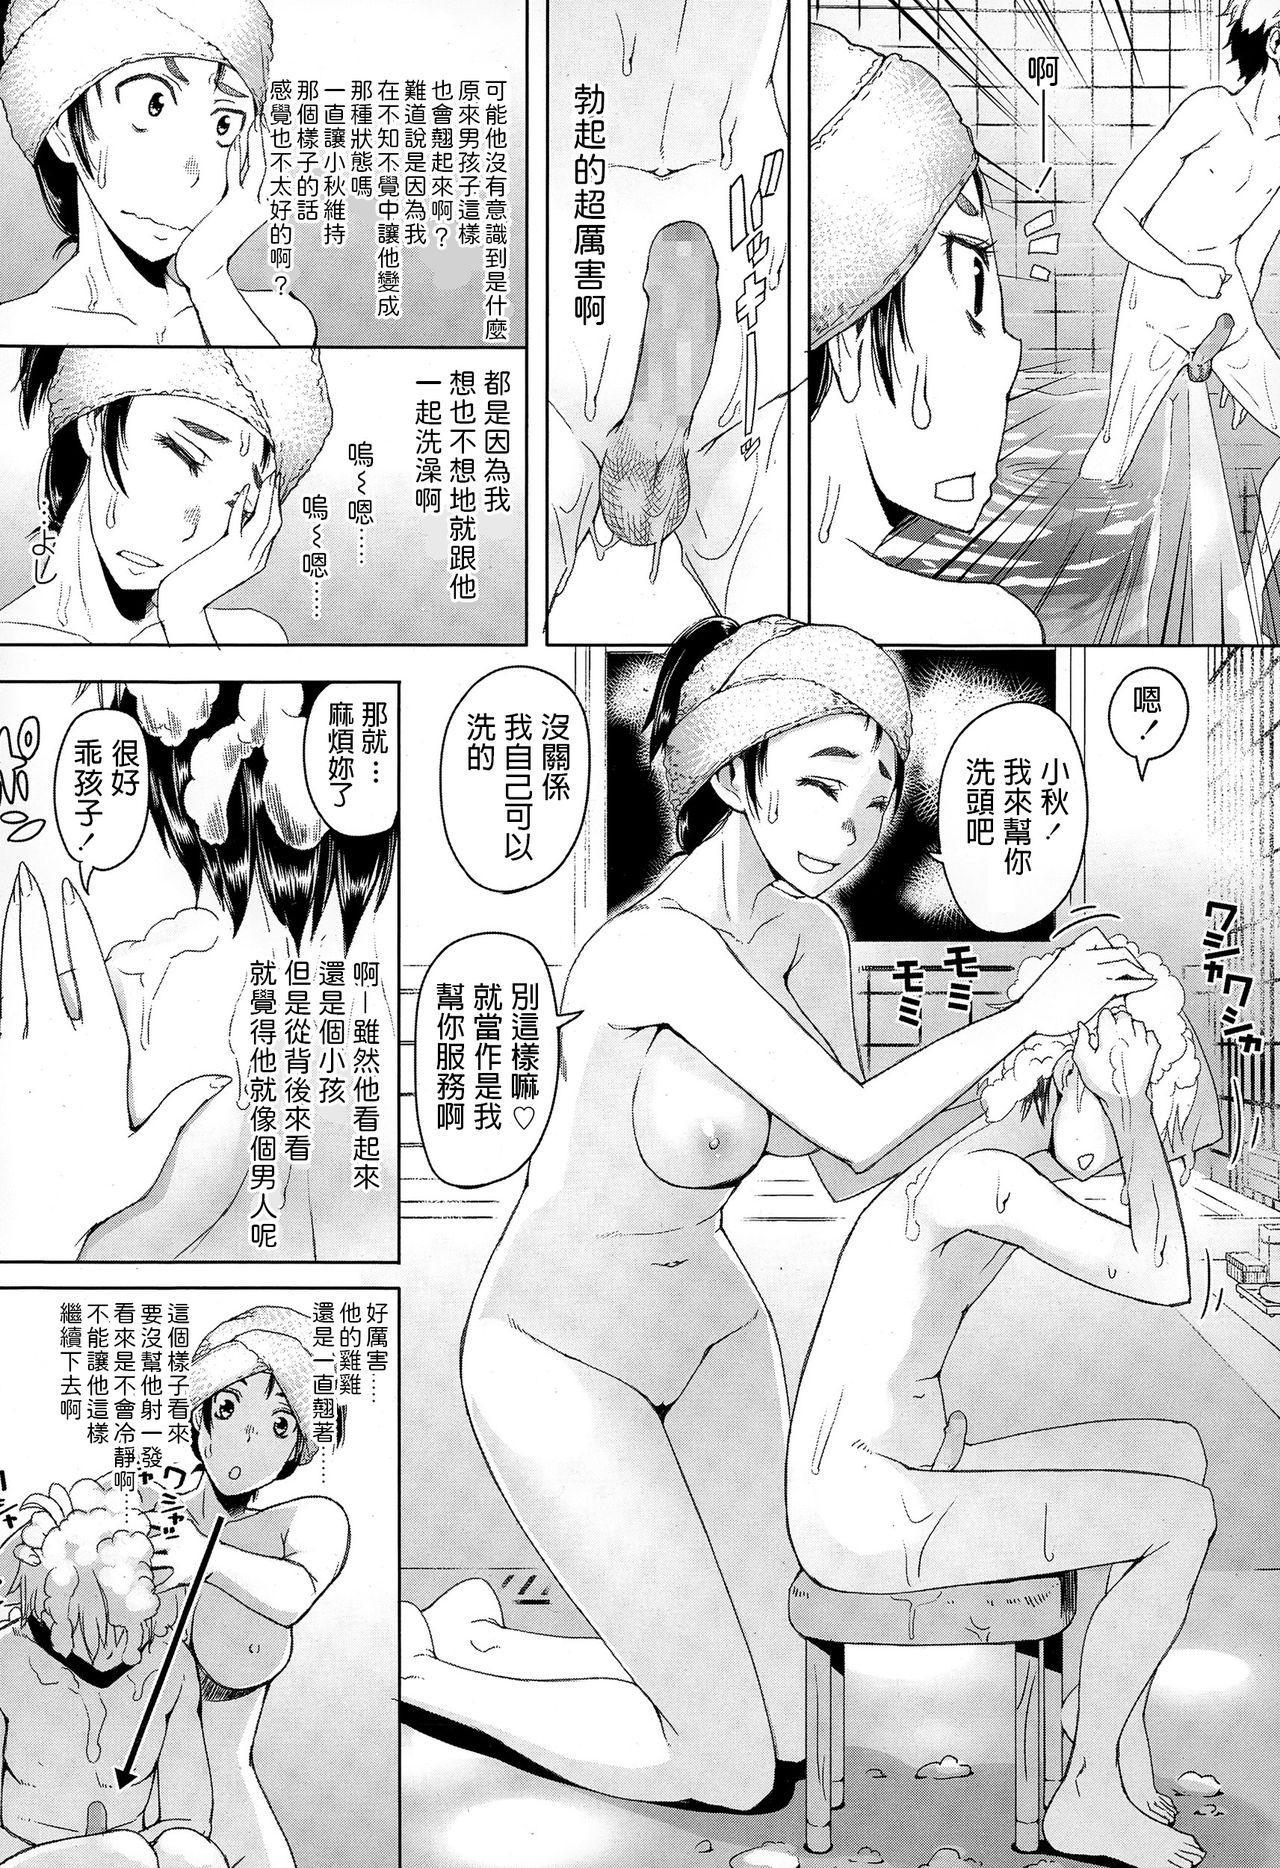 朝木貴行   女子高生のお留守番  COMIC 高 Vol.4  中文翻譯 5